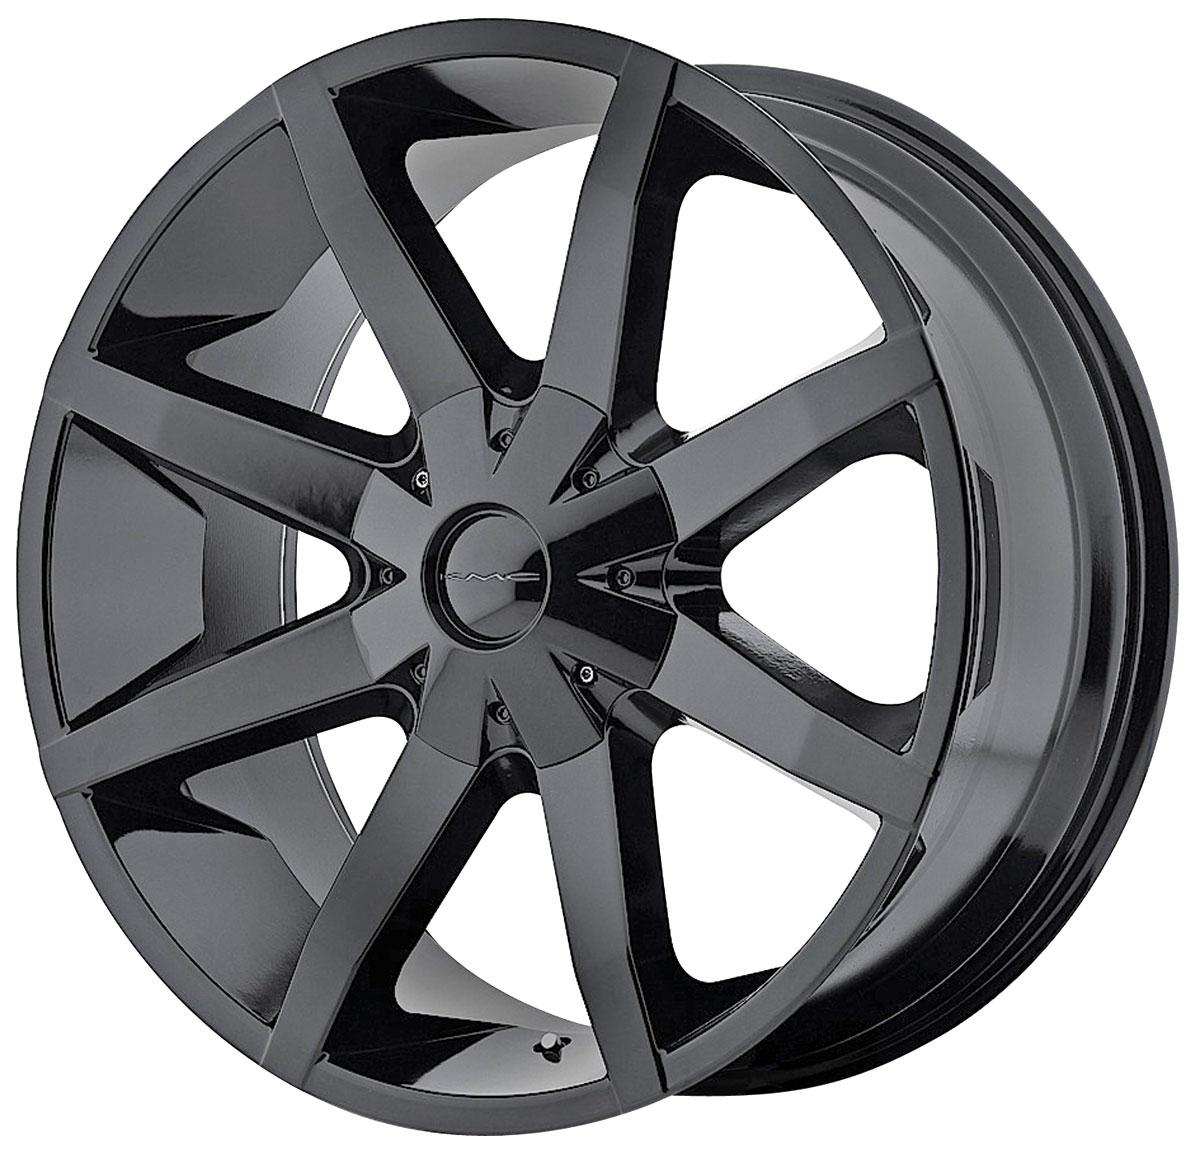 Wheel, KMC, KM651 SLIDE, 1999-2019 Escalade, 22X9.5